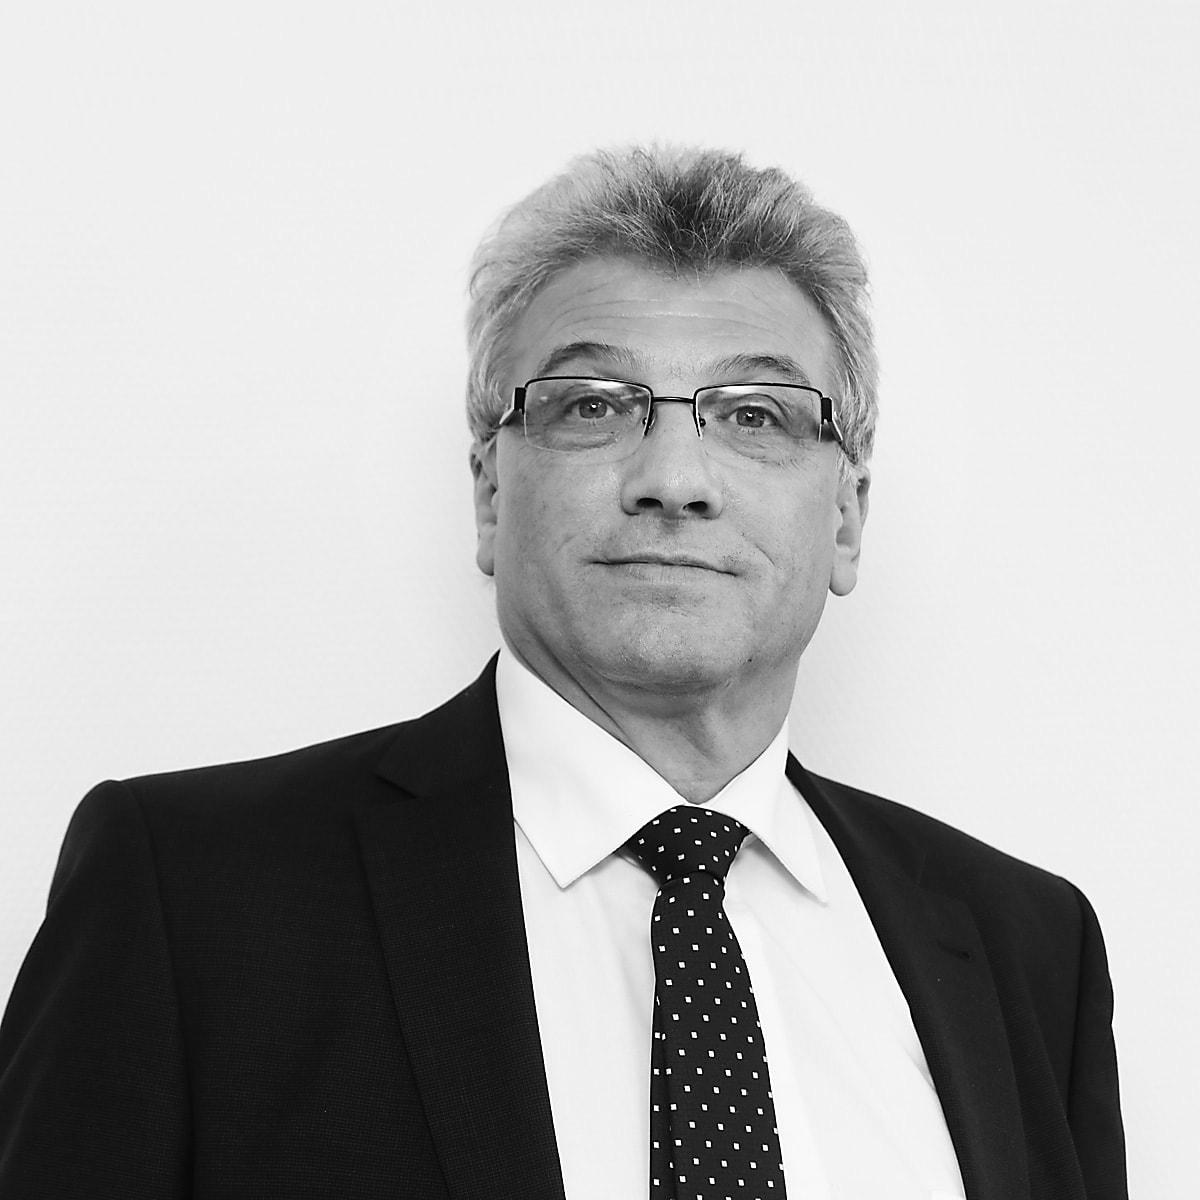 François GRILLO